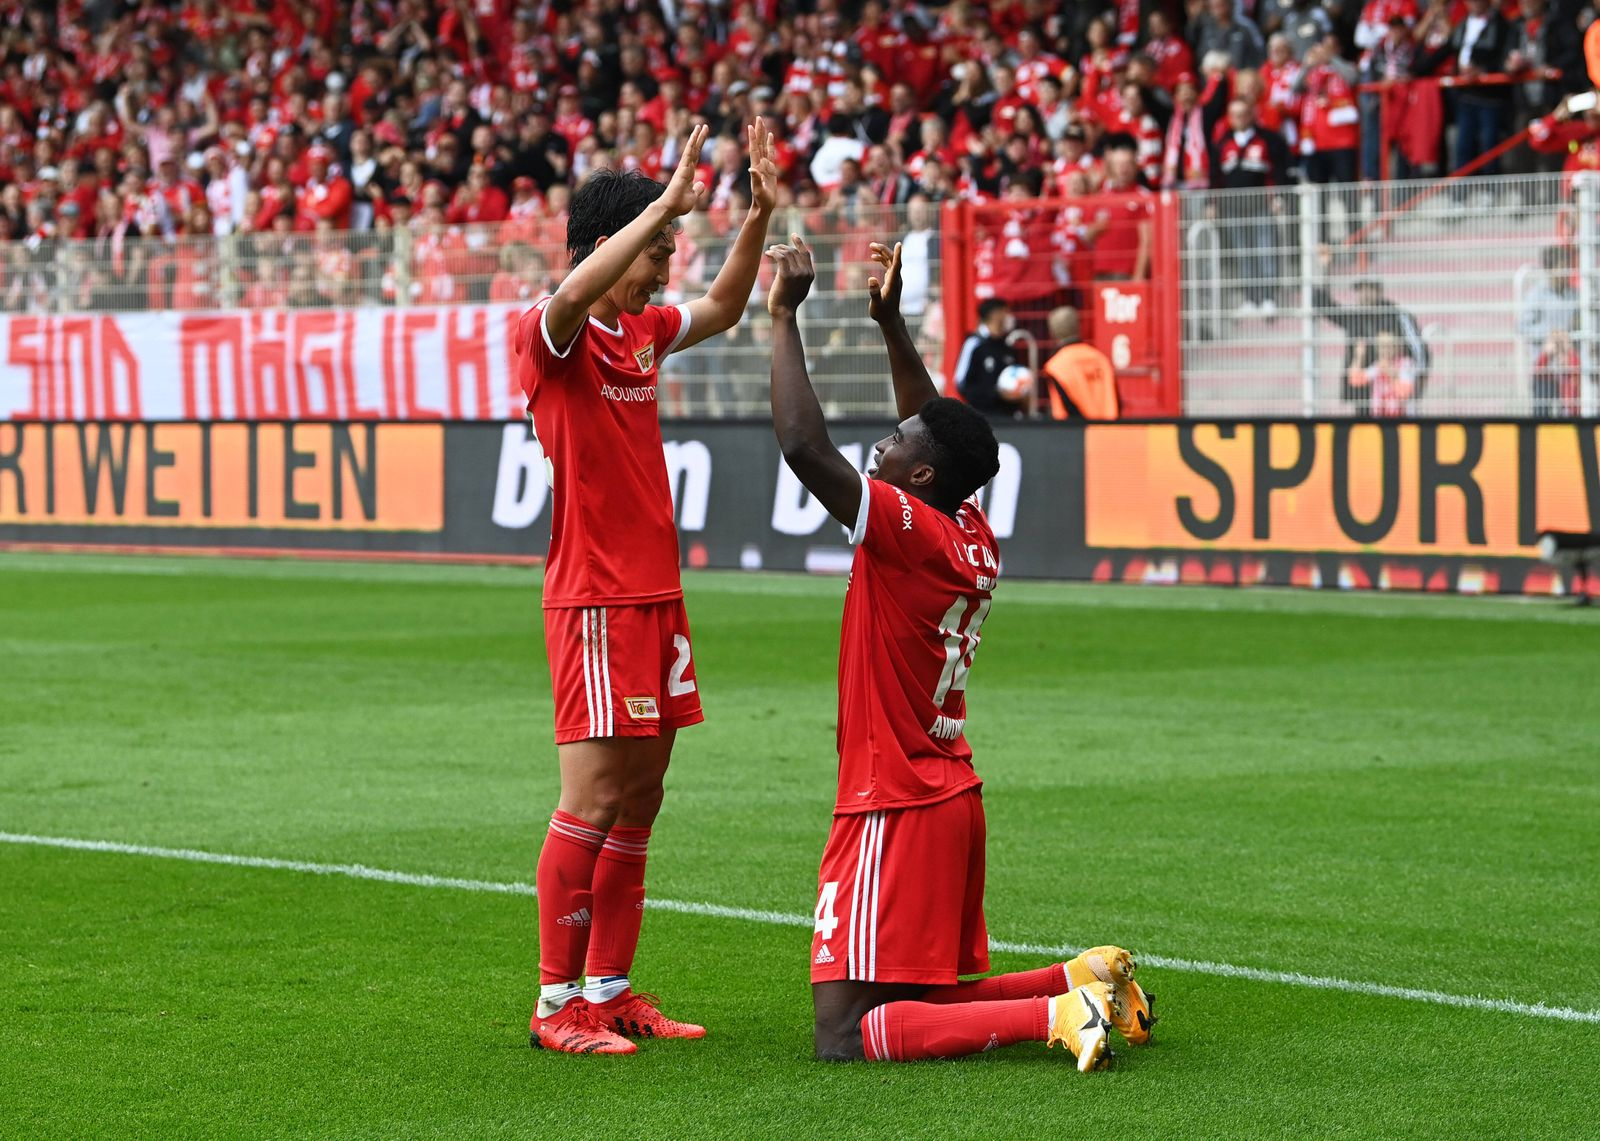 Fussball, Herren, Saison 2021/2022, 1. Bundesliga (3. Spieltag), 1. FC Union Berlin - Borussia Mönchengladbach), v. l. G